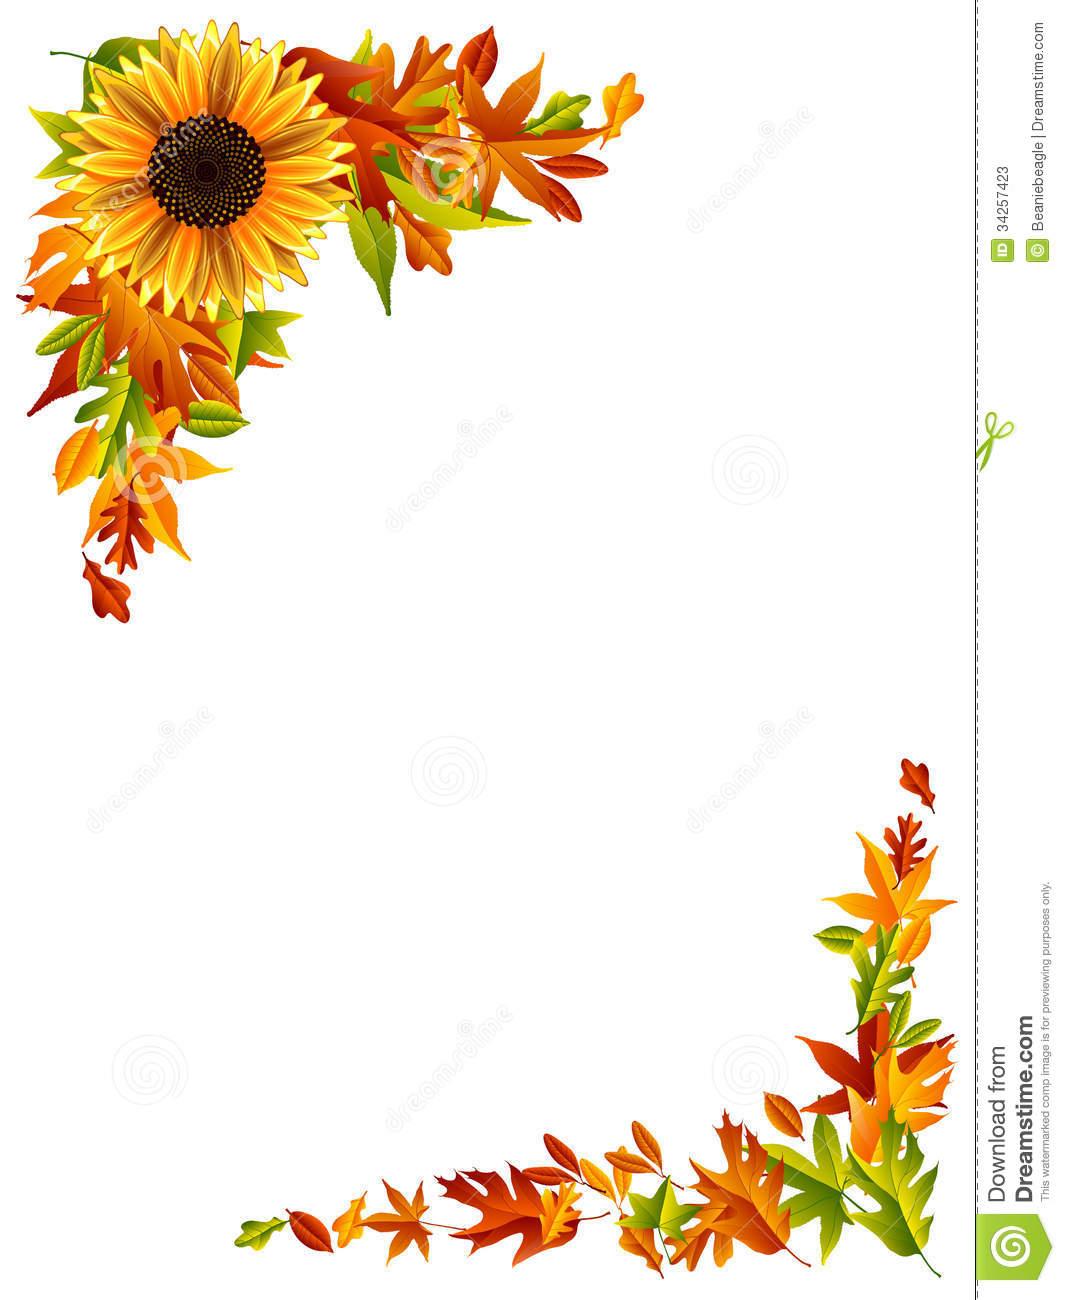 Autumn Clip Art. Resolution 1065x1300 . -Autumn Clip Art. Resolution 1065x1300 . Resolution 1065x1300 . Free Thanksgiving Borders And Frames ...-1